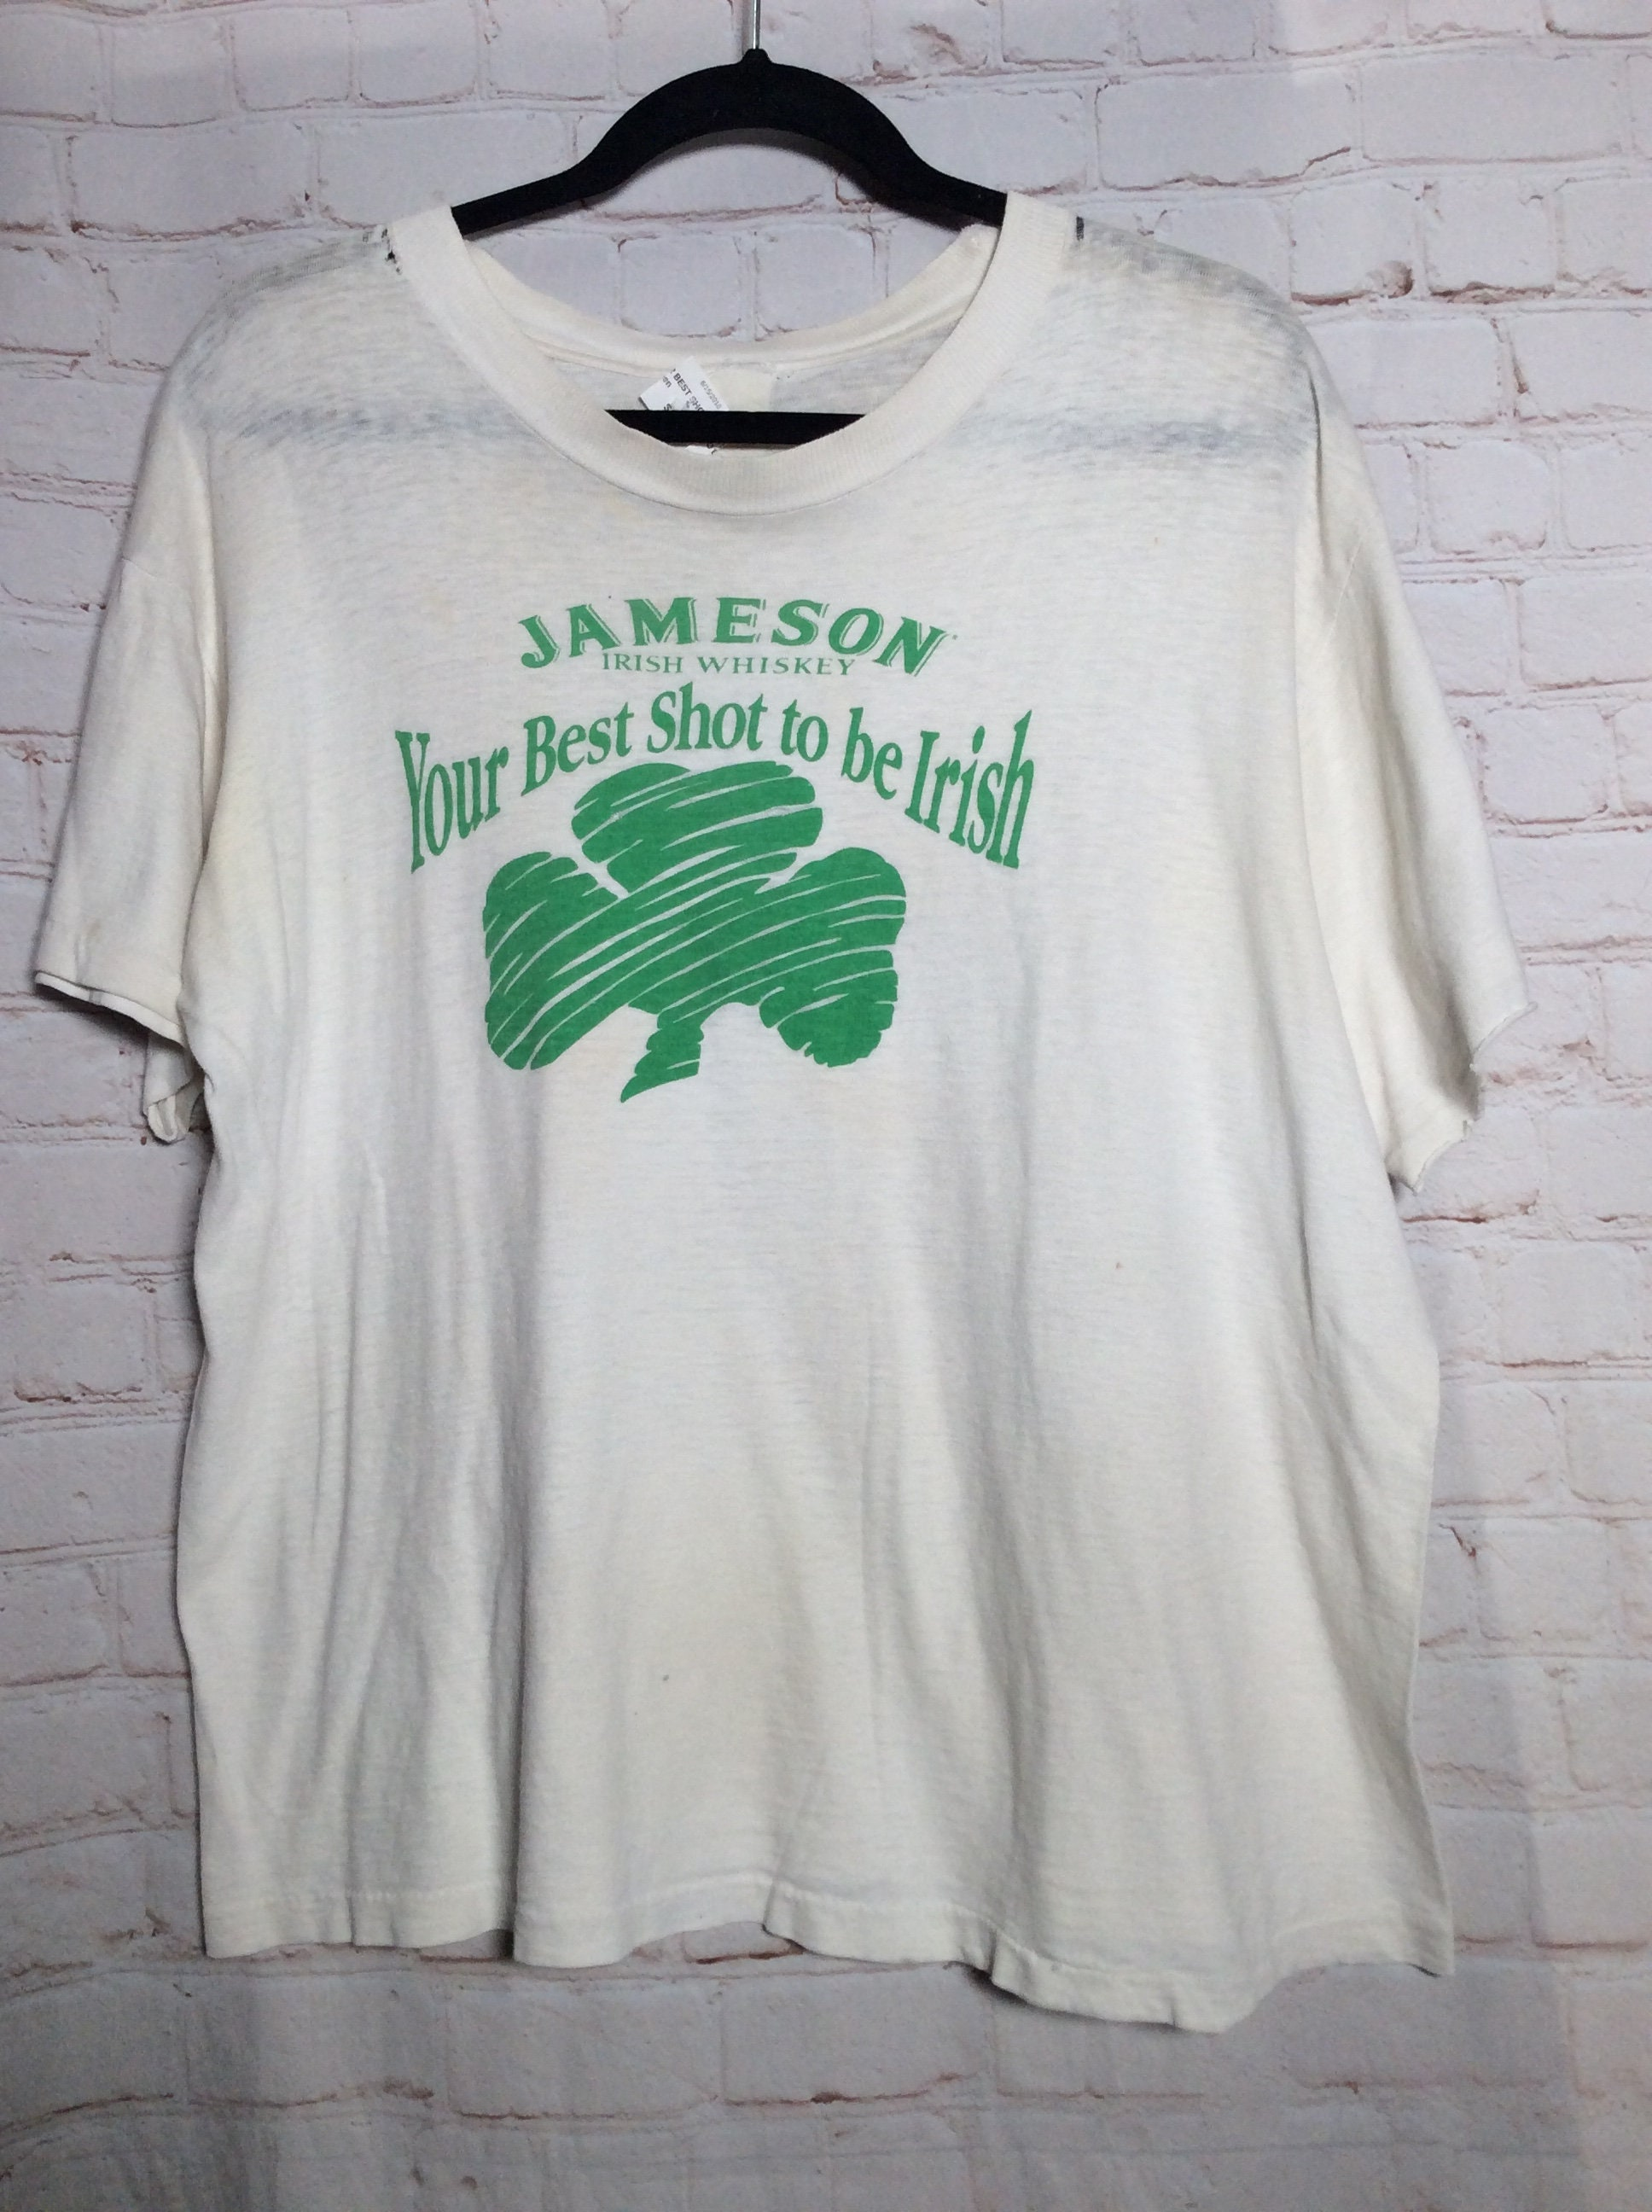 58cd73adb52 Vintage T-shirt Saint Patricks Day Jameson Whiskey your Best